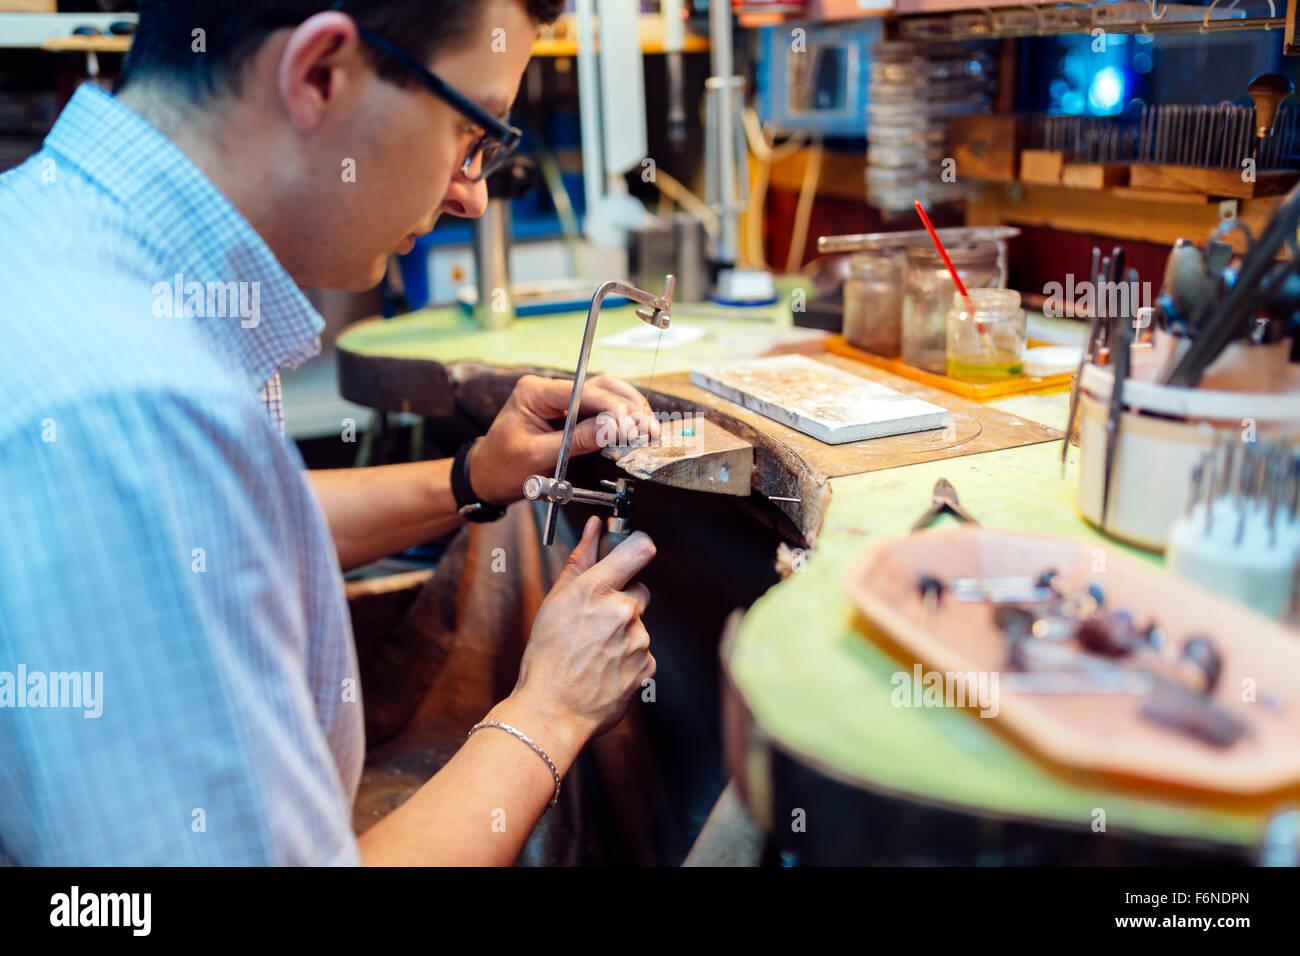 Jeweler creating jewelry - Stock Image